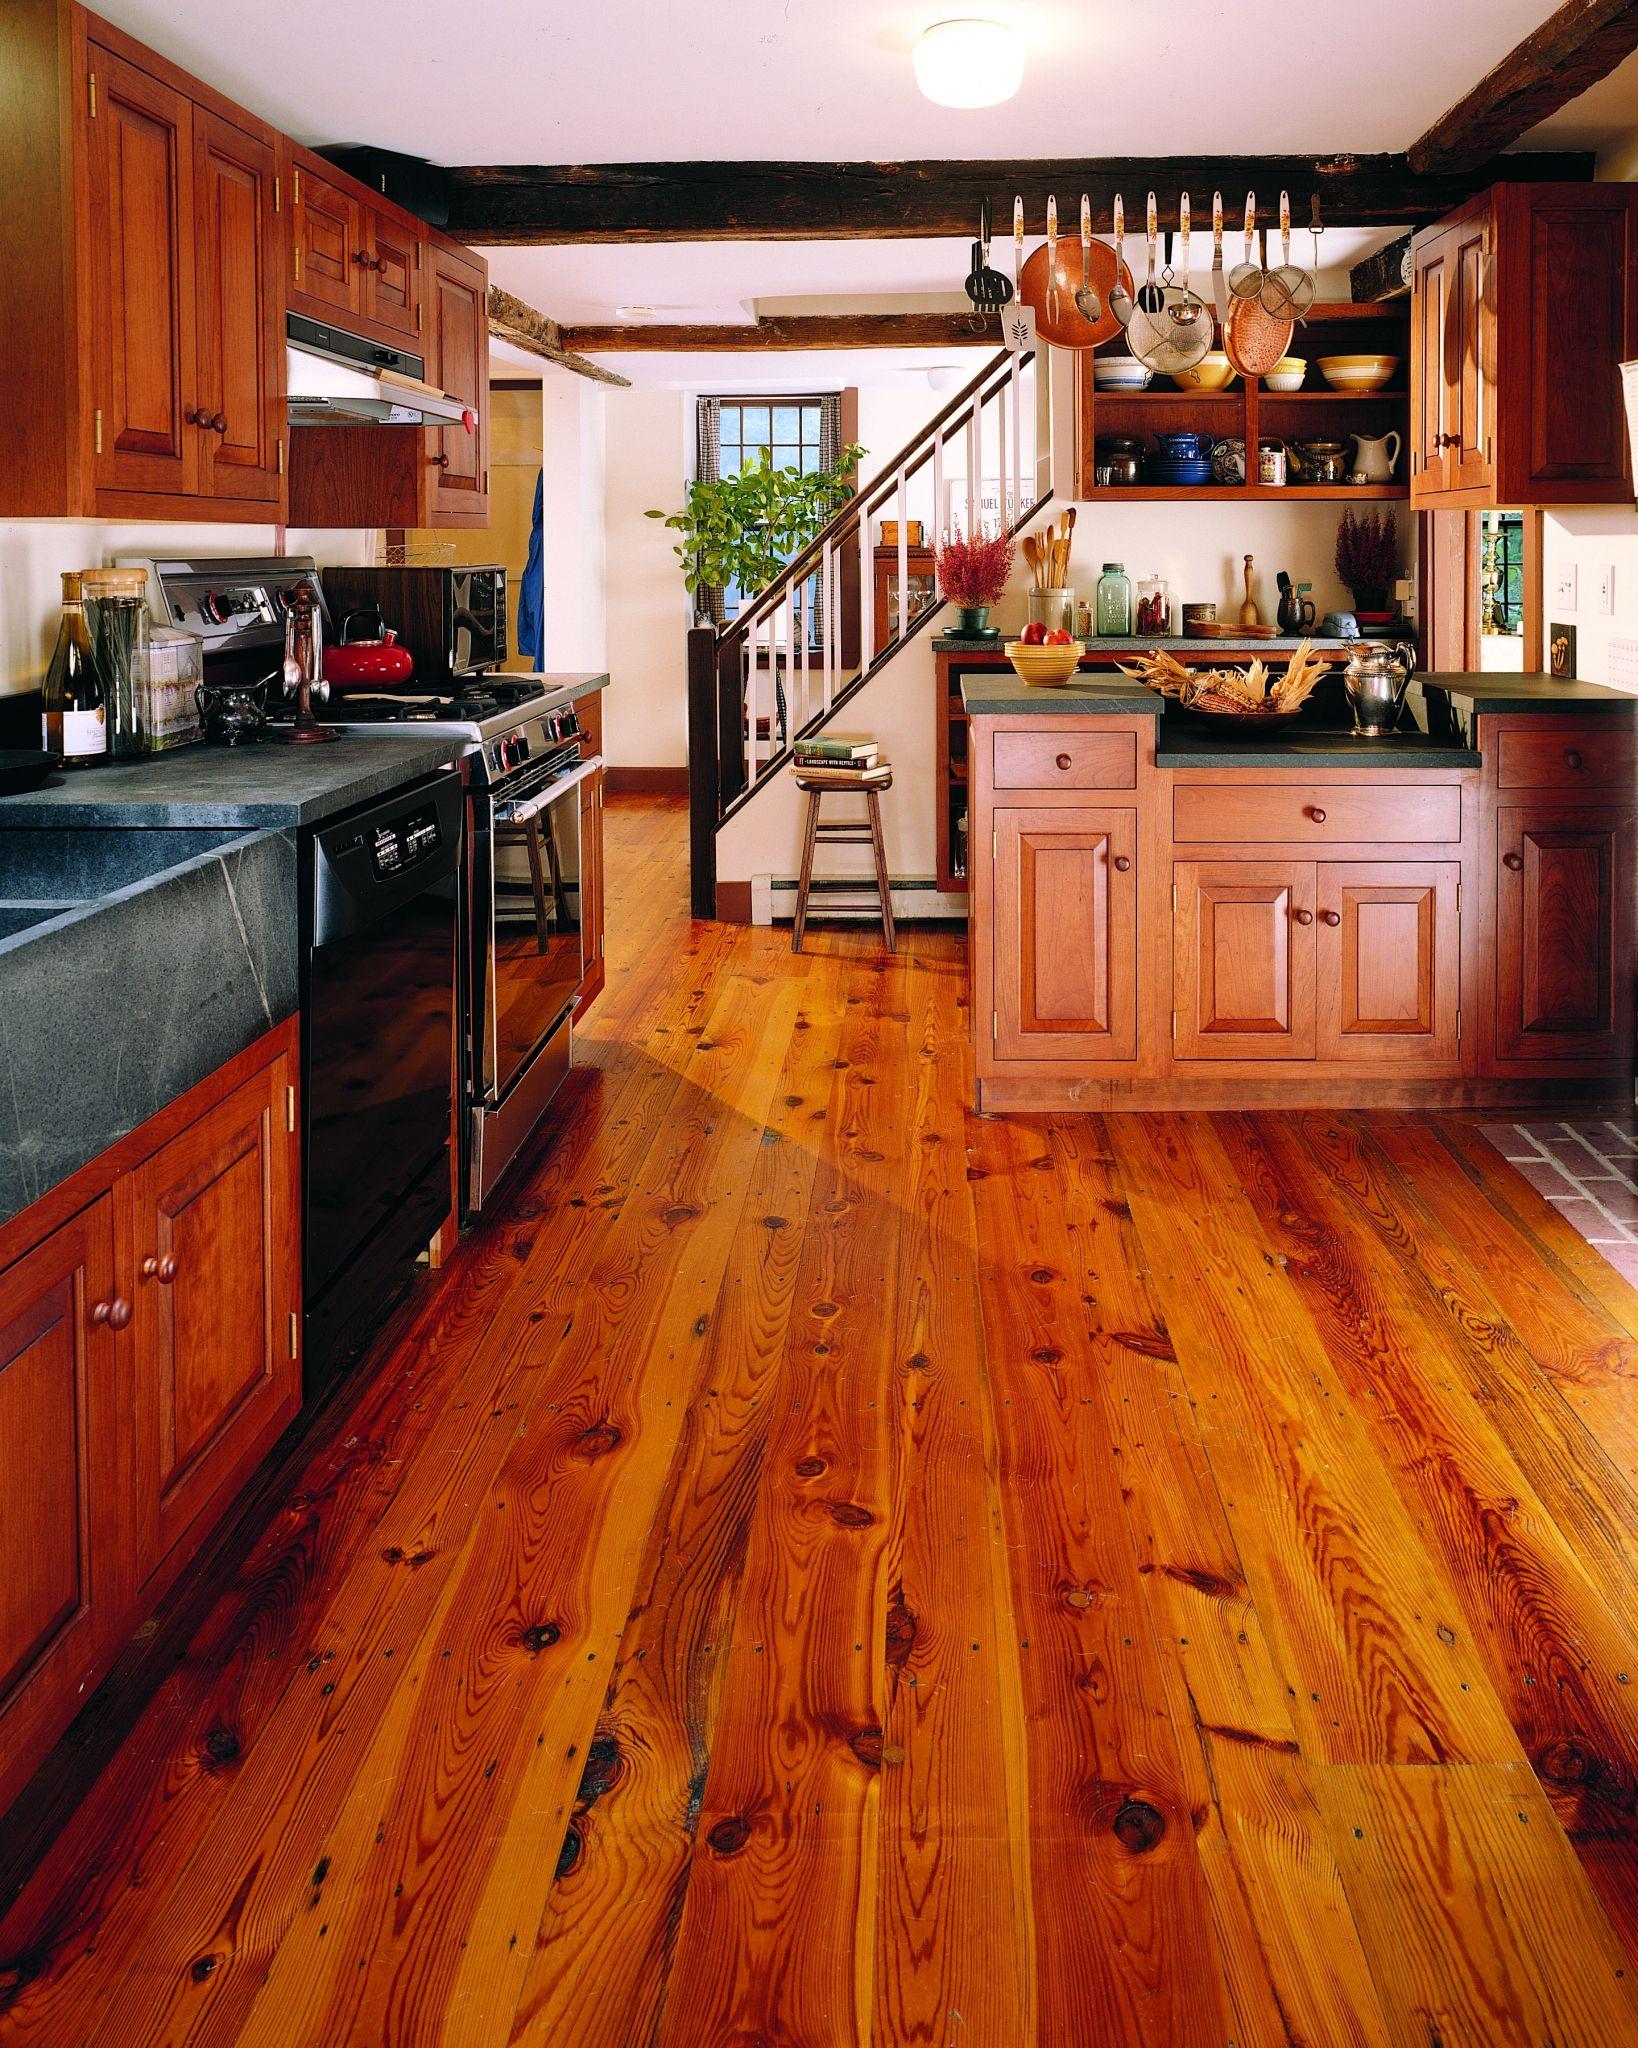 Reclaimed Heart Pine Flooring in Kitchen Pine floors